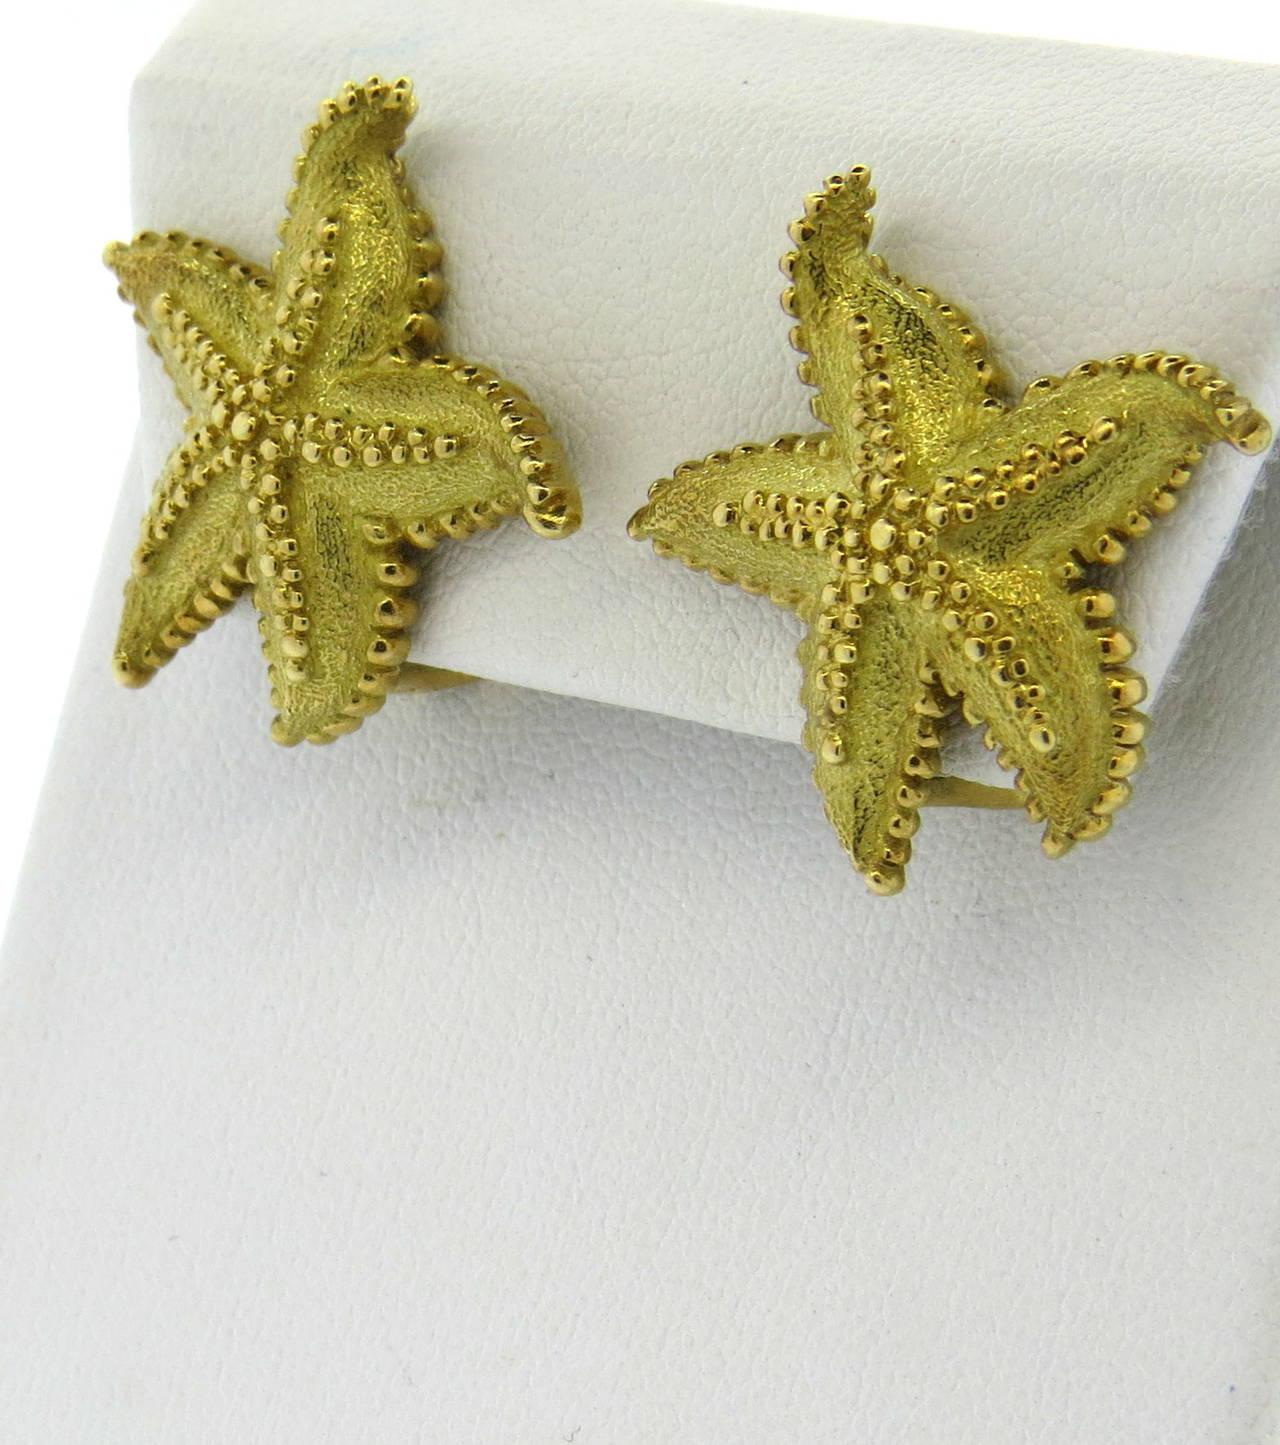 e63e92ed7 ... tiffany co. gold starfish earrings 2 ...